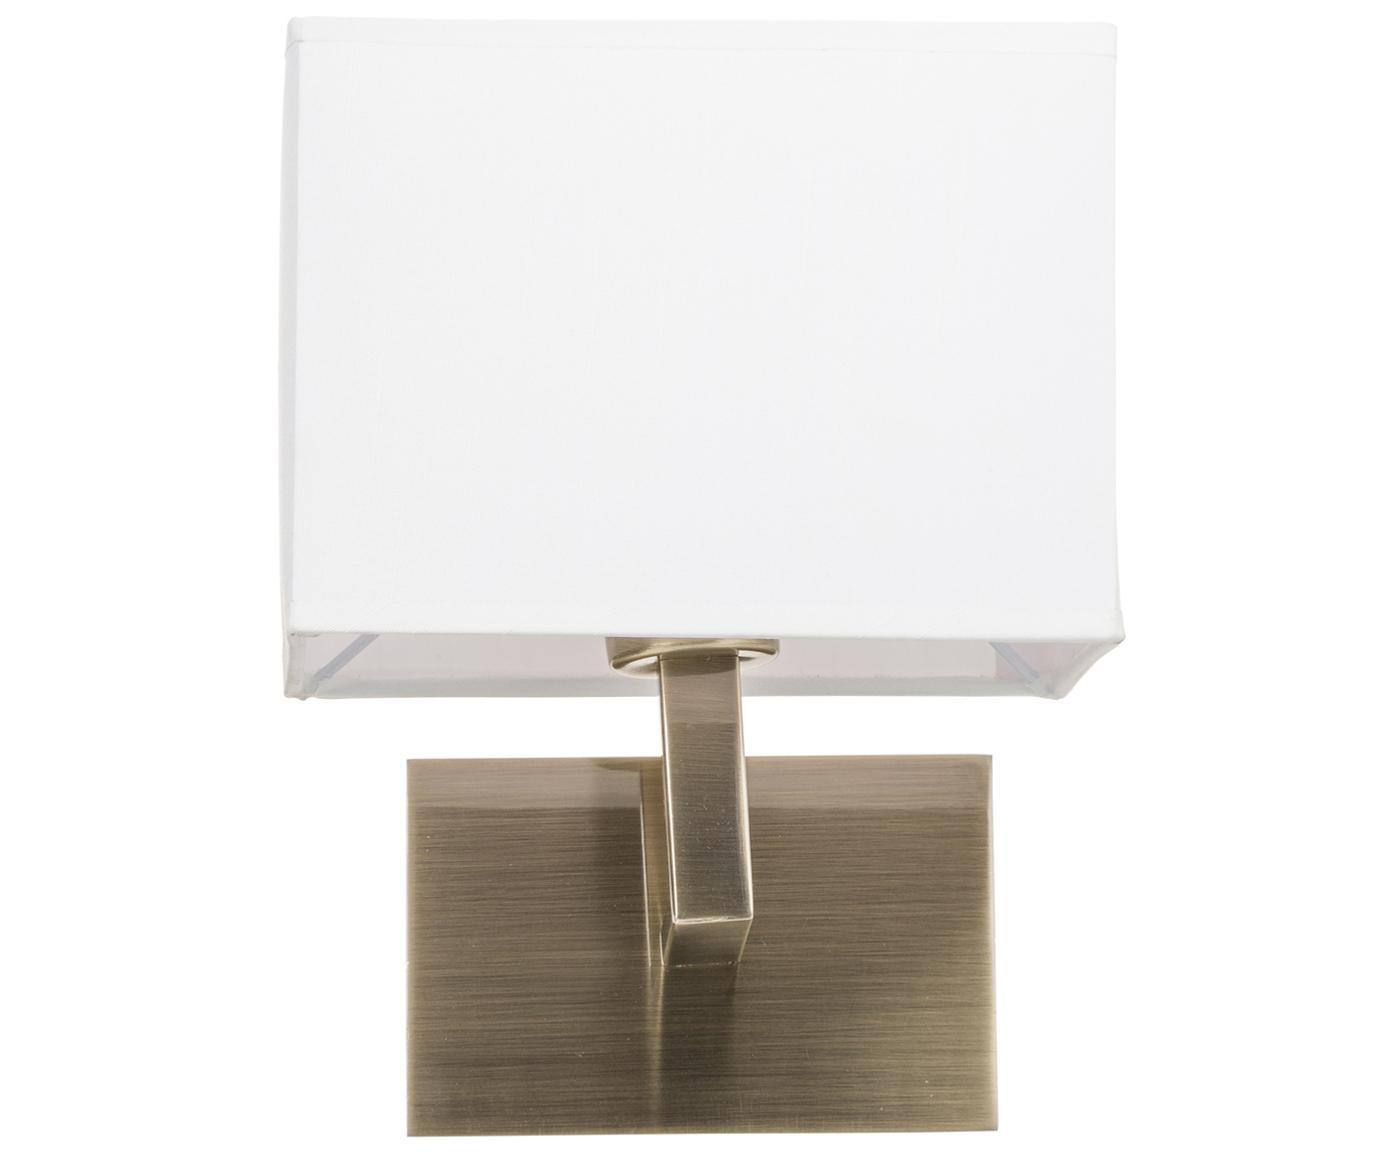 Applique Prague, Paralume: tessile, Bianco, ottonato, Larg. 20 x Alt. 25 cm